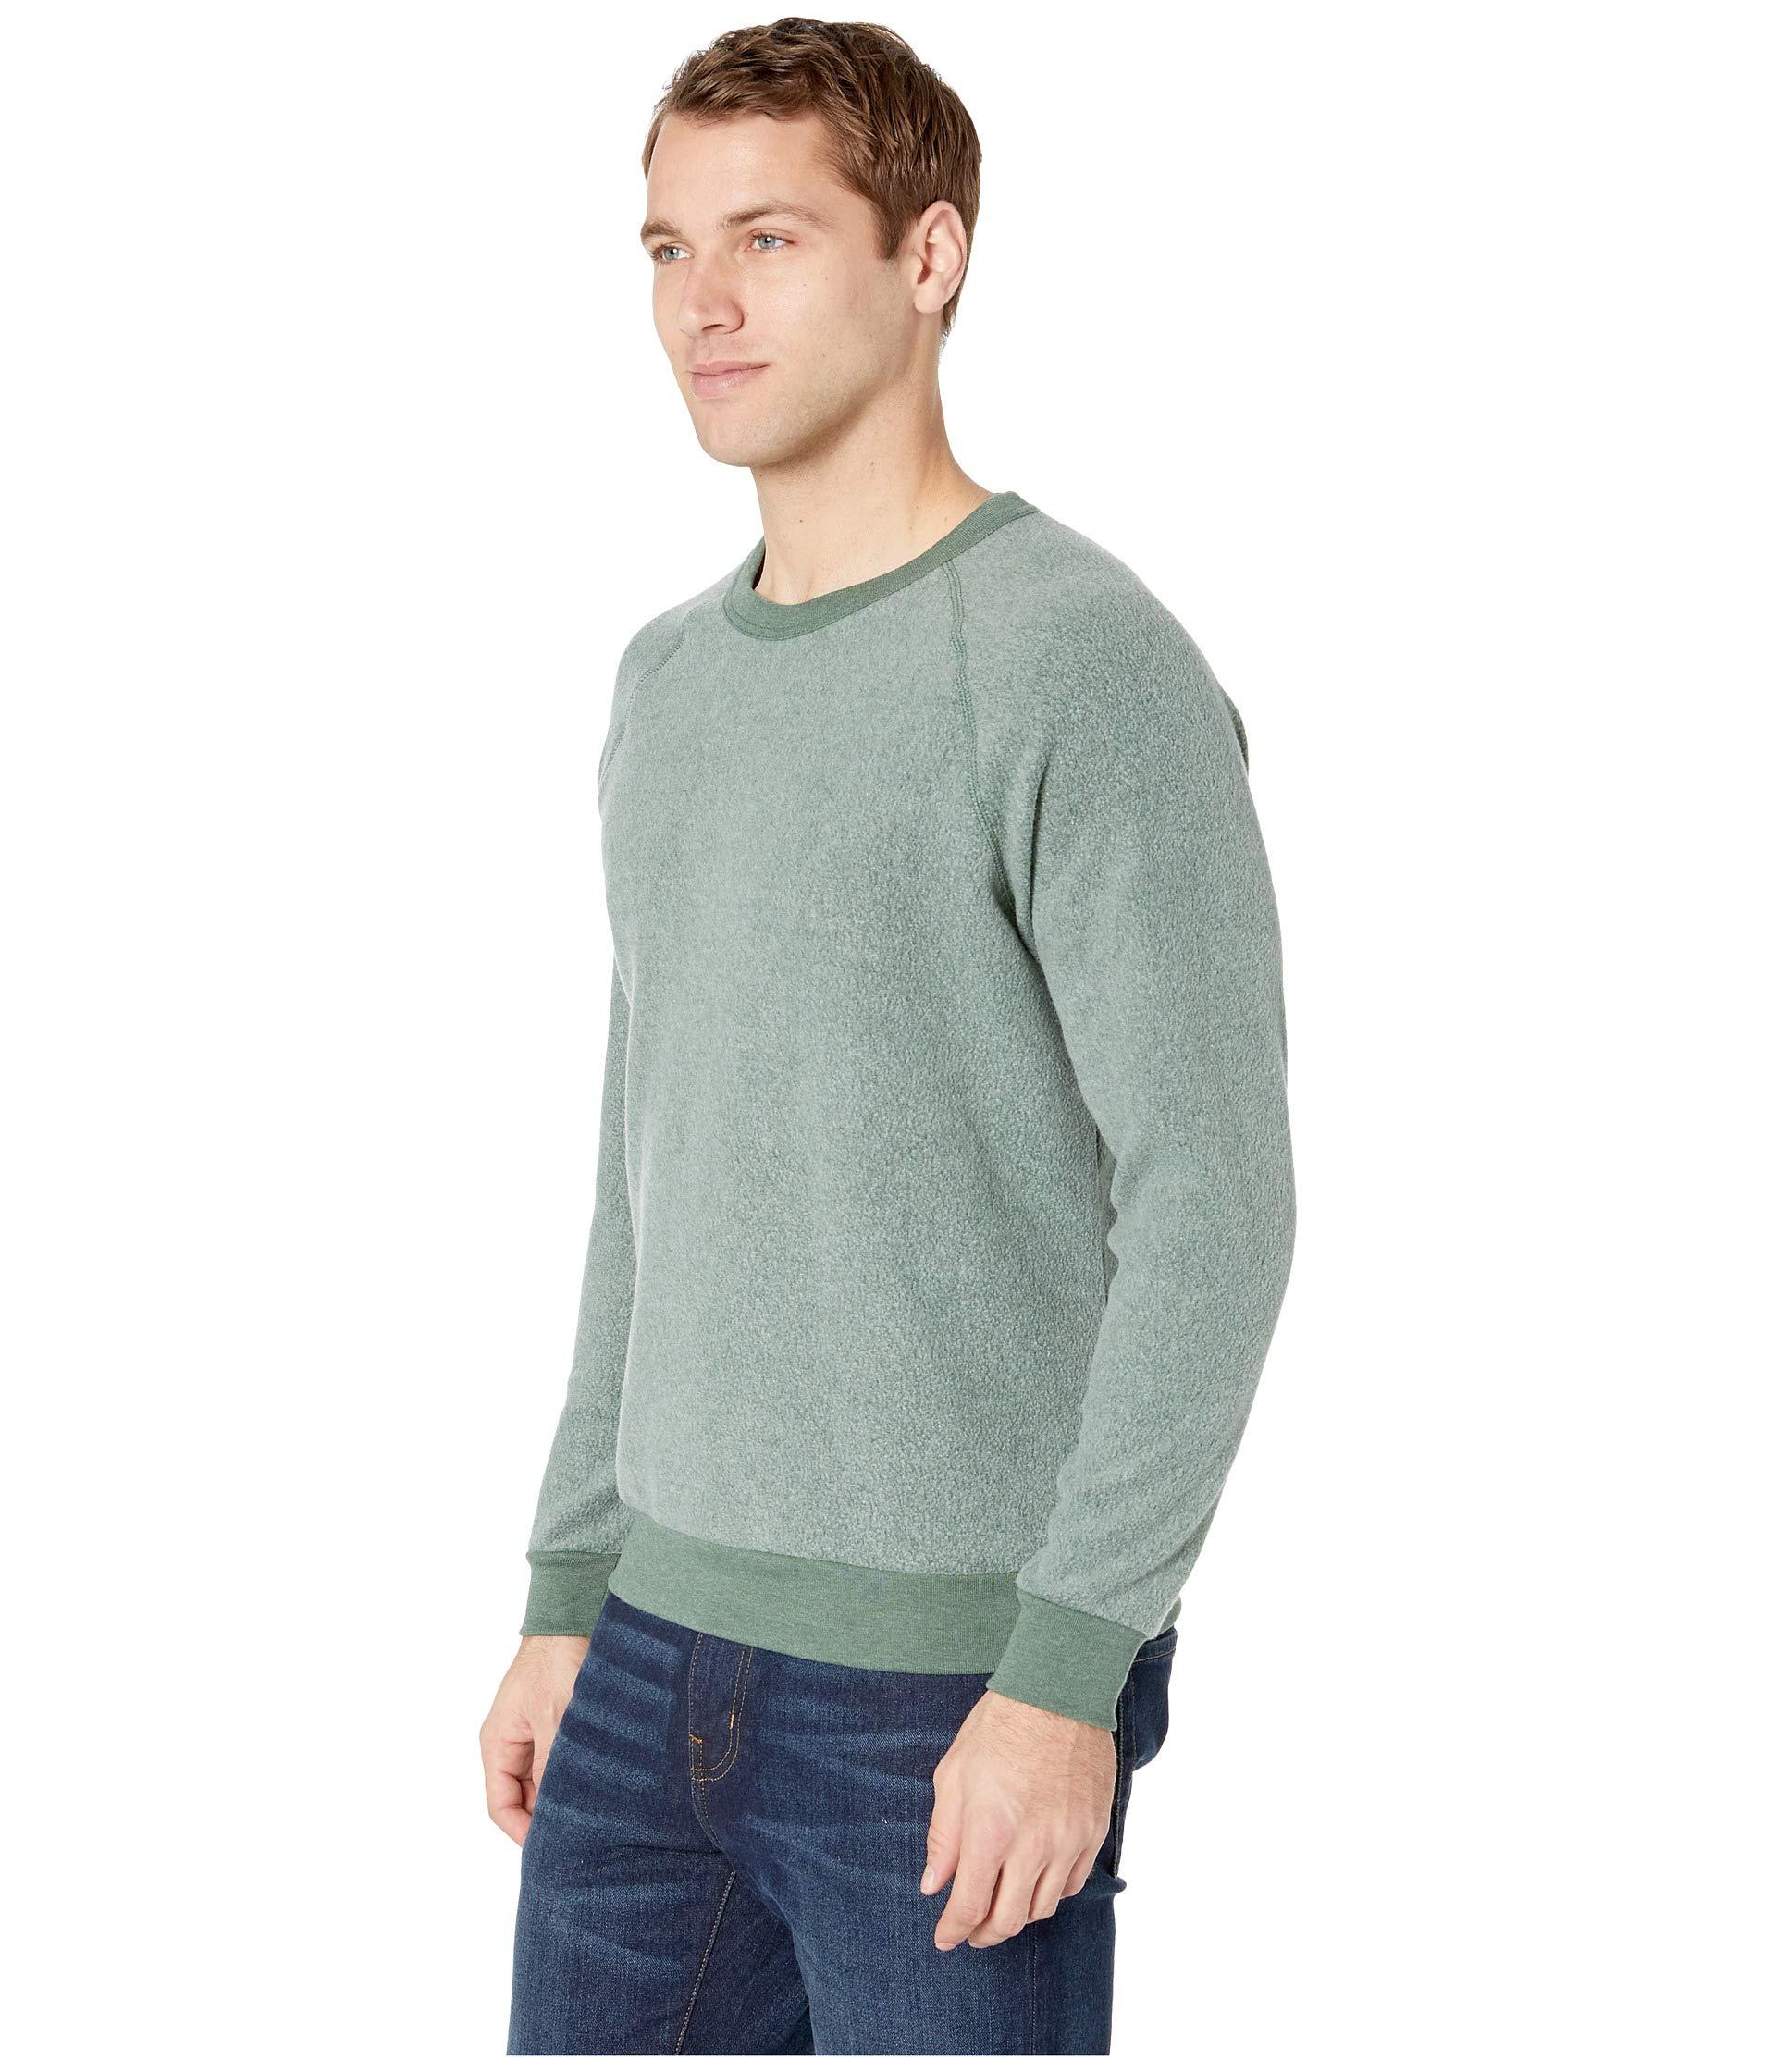 Teddy Fleece Eco Pine Alternative Dusty Champ True Sweatshirt t6w7q